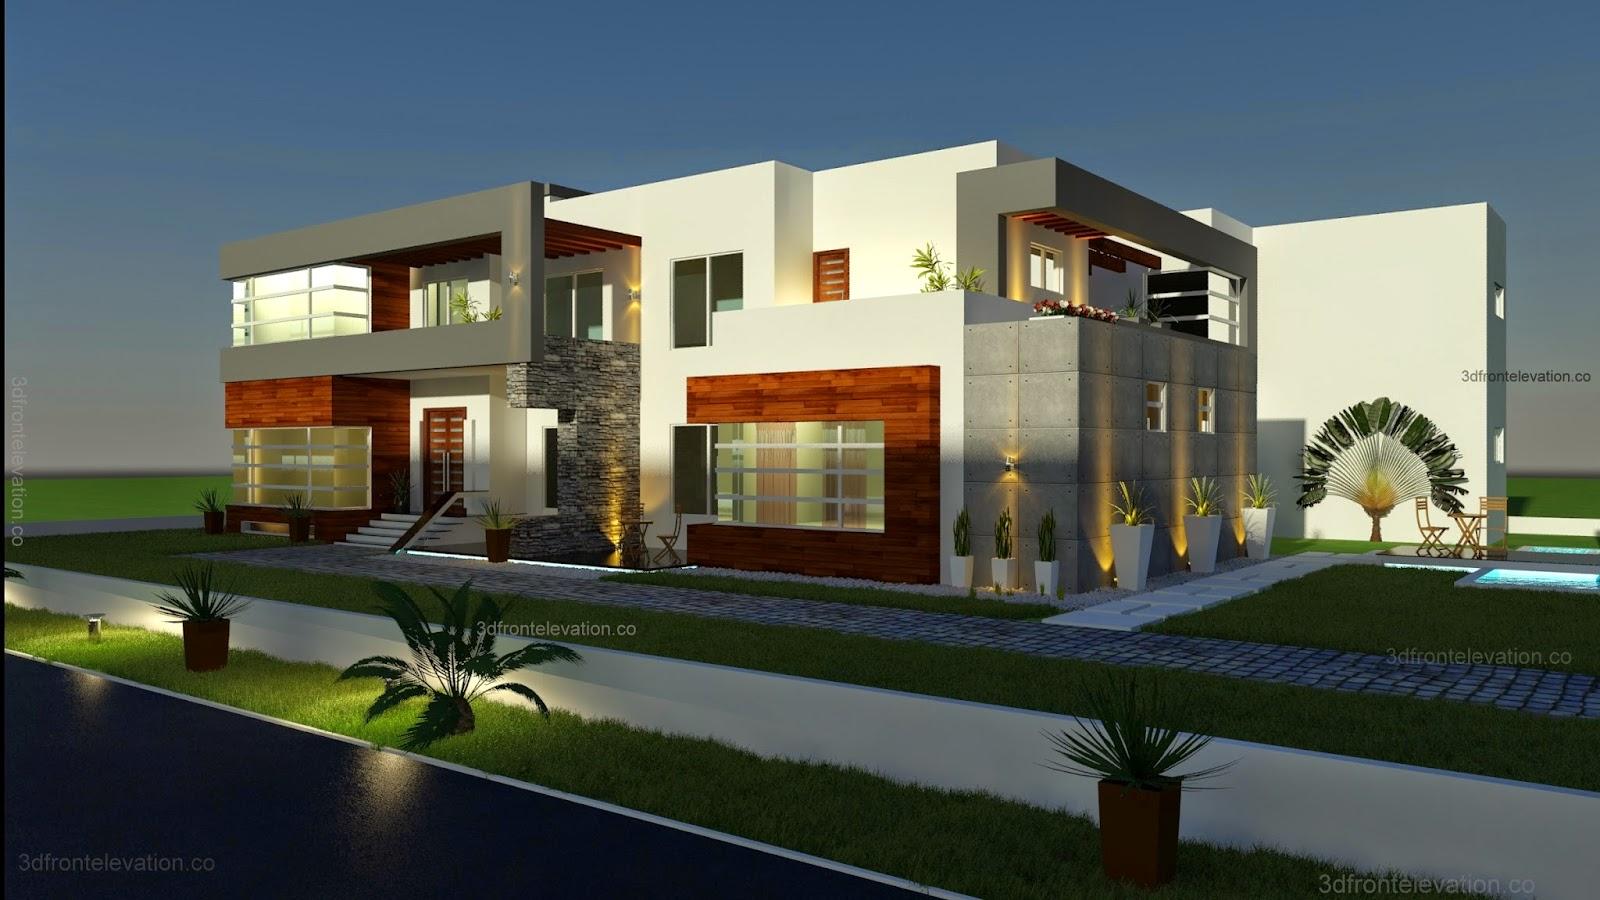 Square Home Floor Plans 3d Front Elevation Com 500 Square Meter Modern